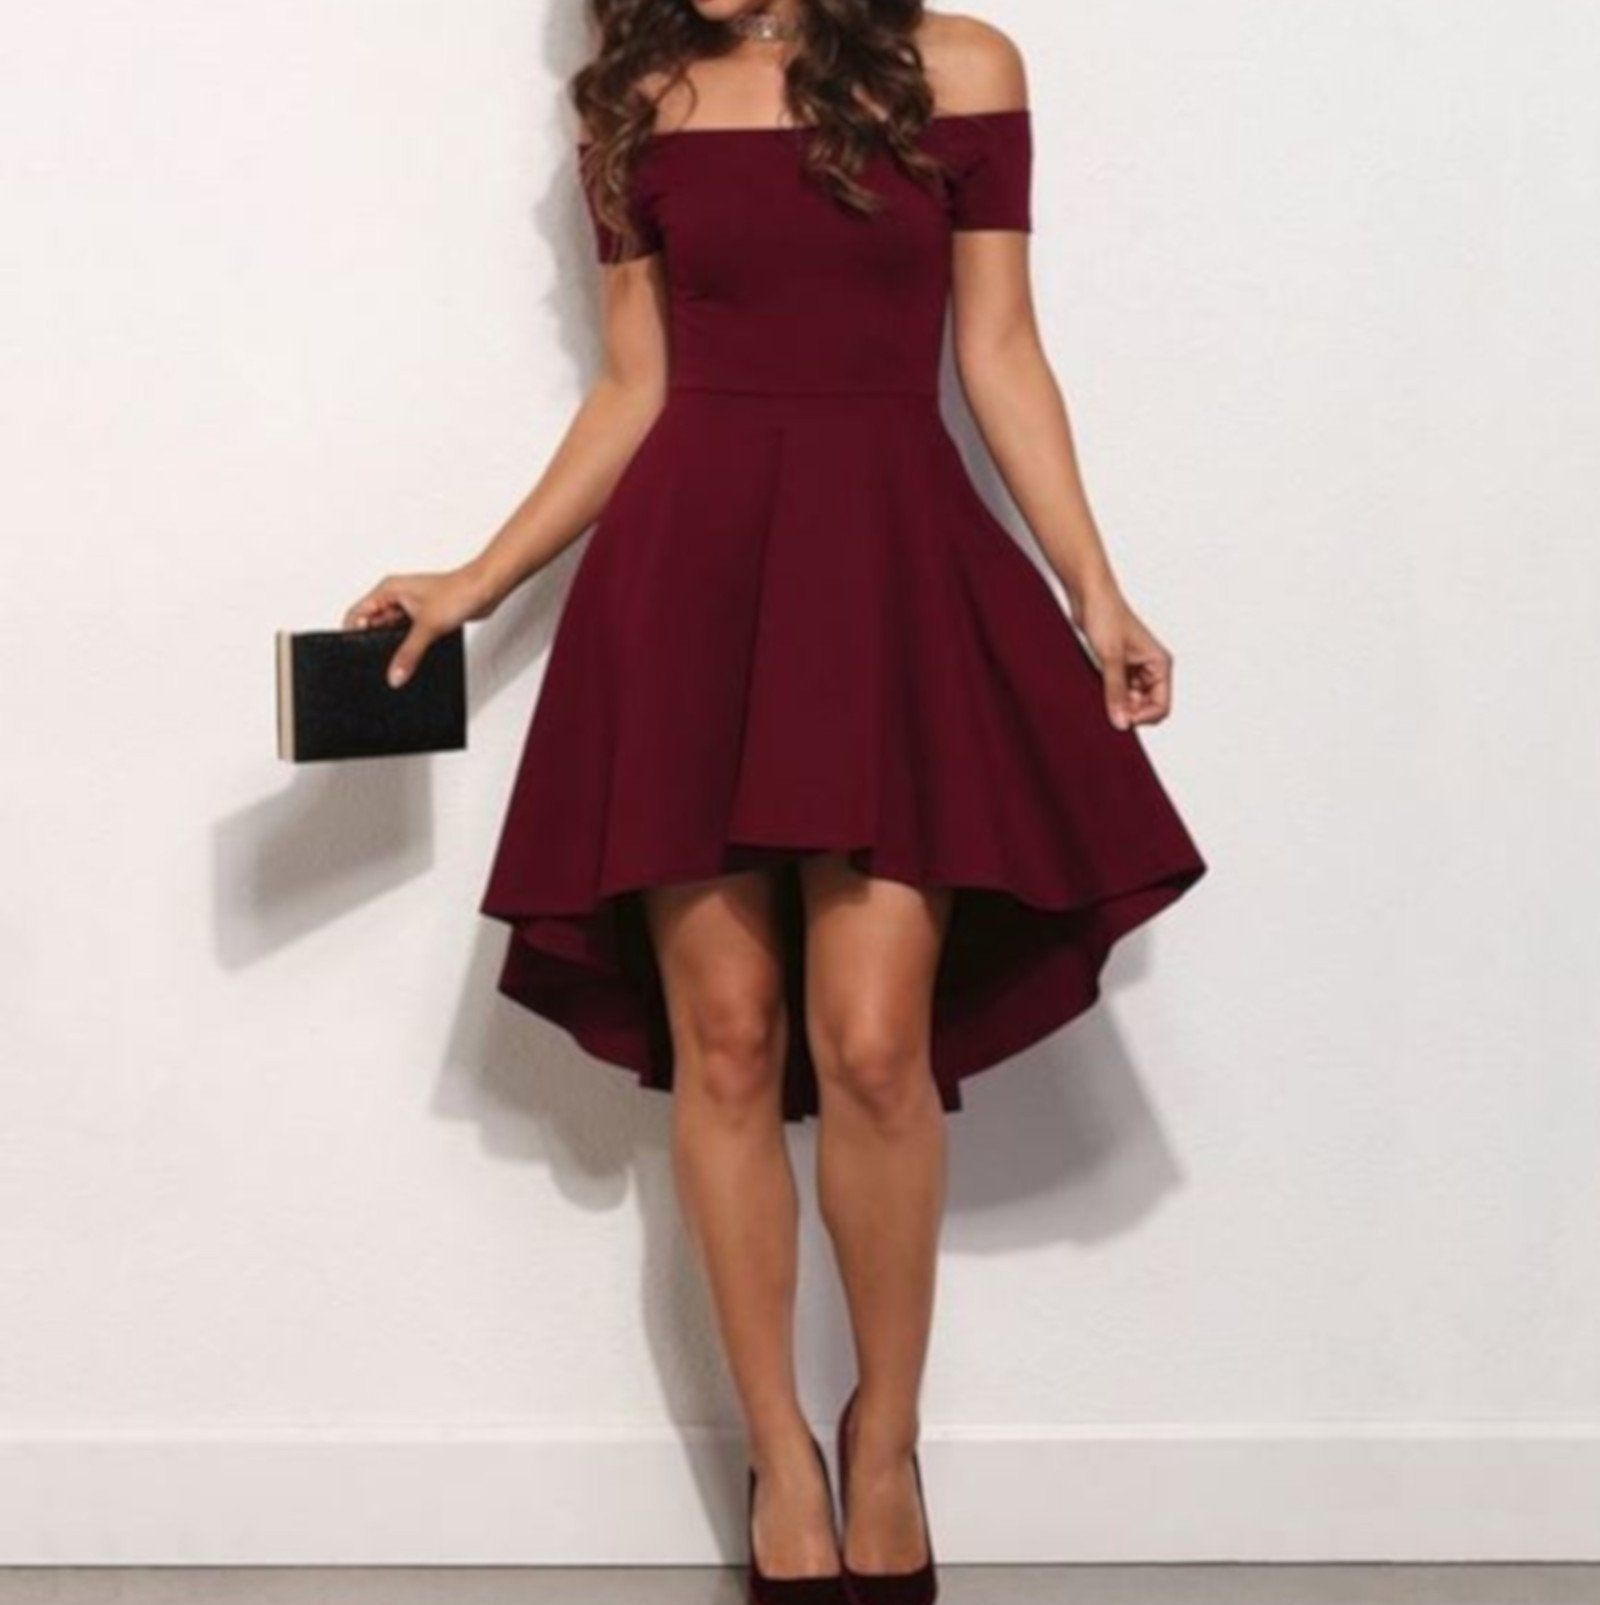 Vintage Wine Red Off The Shoulder Nye High Low Cocktail Dress High Low Cocktail Dress High Low Party Dresses Ball Dresses [ 1605 x 1600 Pixel ]